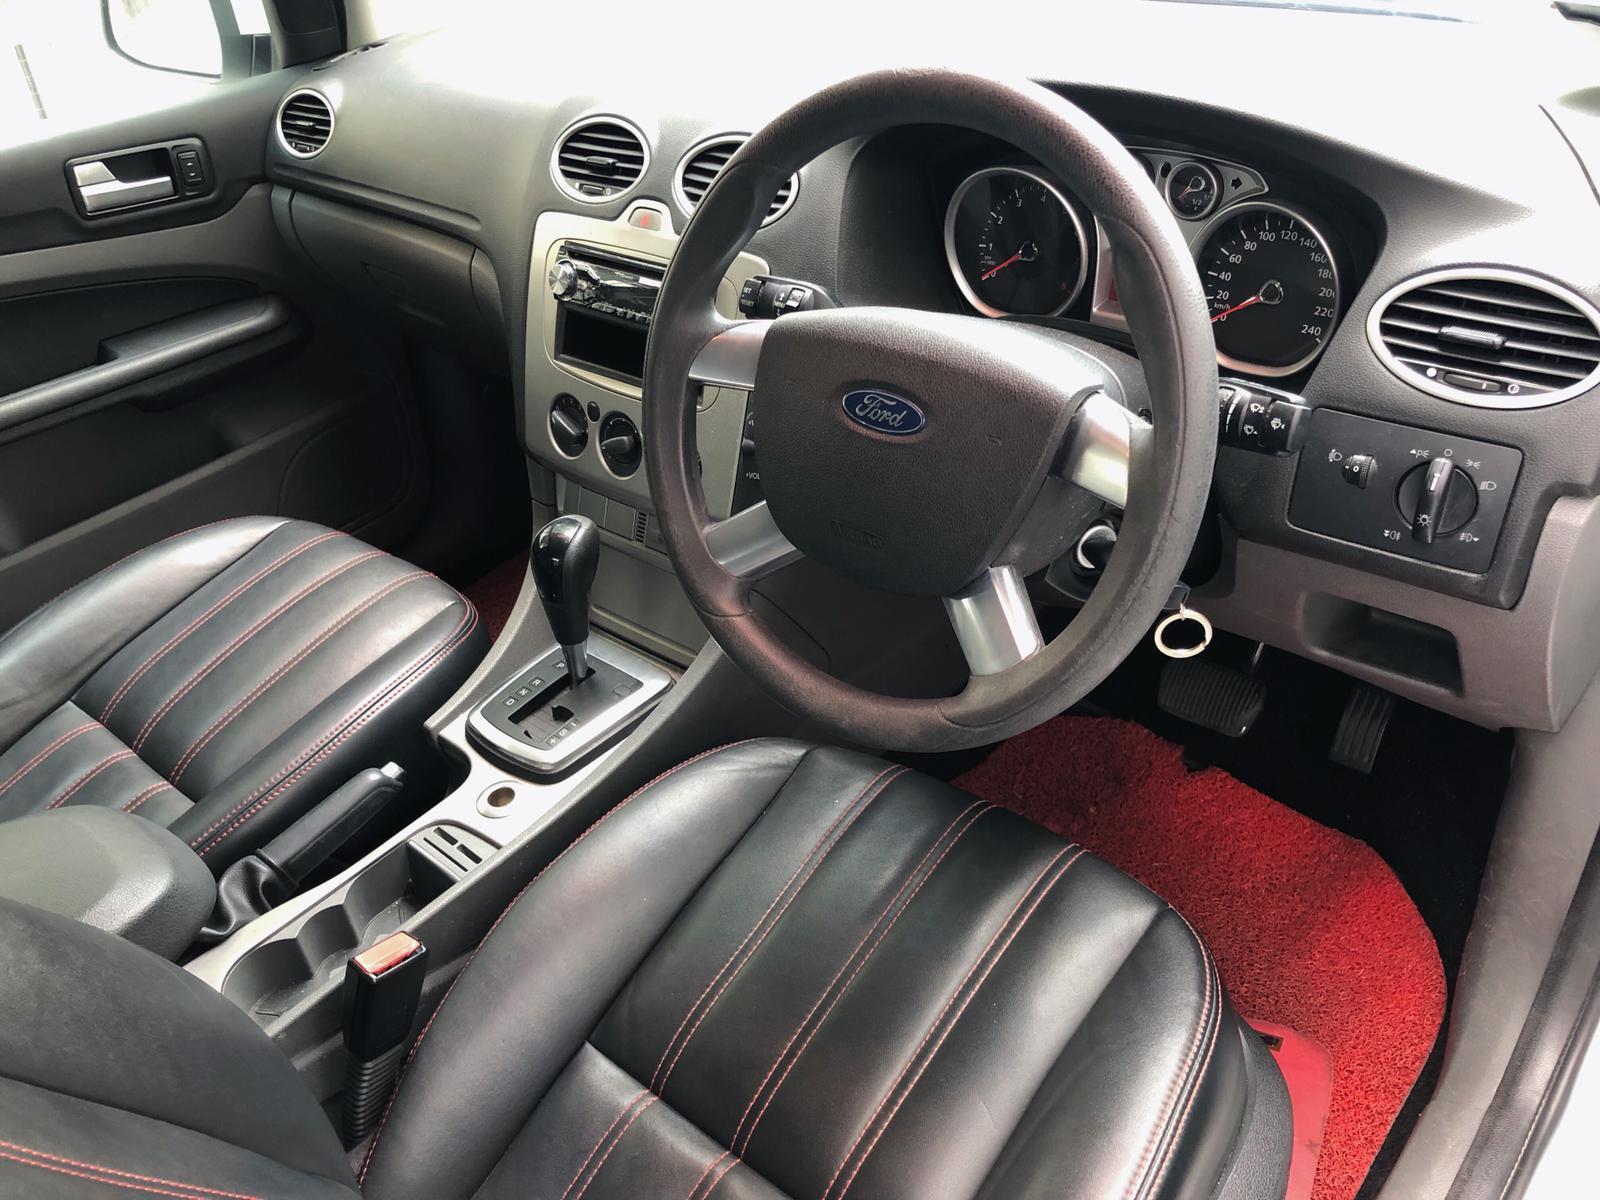 $50 Ford Focus 1.6a*TOP CONDITION*conti car BEFORE GOJEK REBATE Altis Car Axio Camry Honda Civic Cars Hyundai Avante Grab Rental Gojek Or Personal Use Low price and Cheap